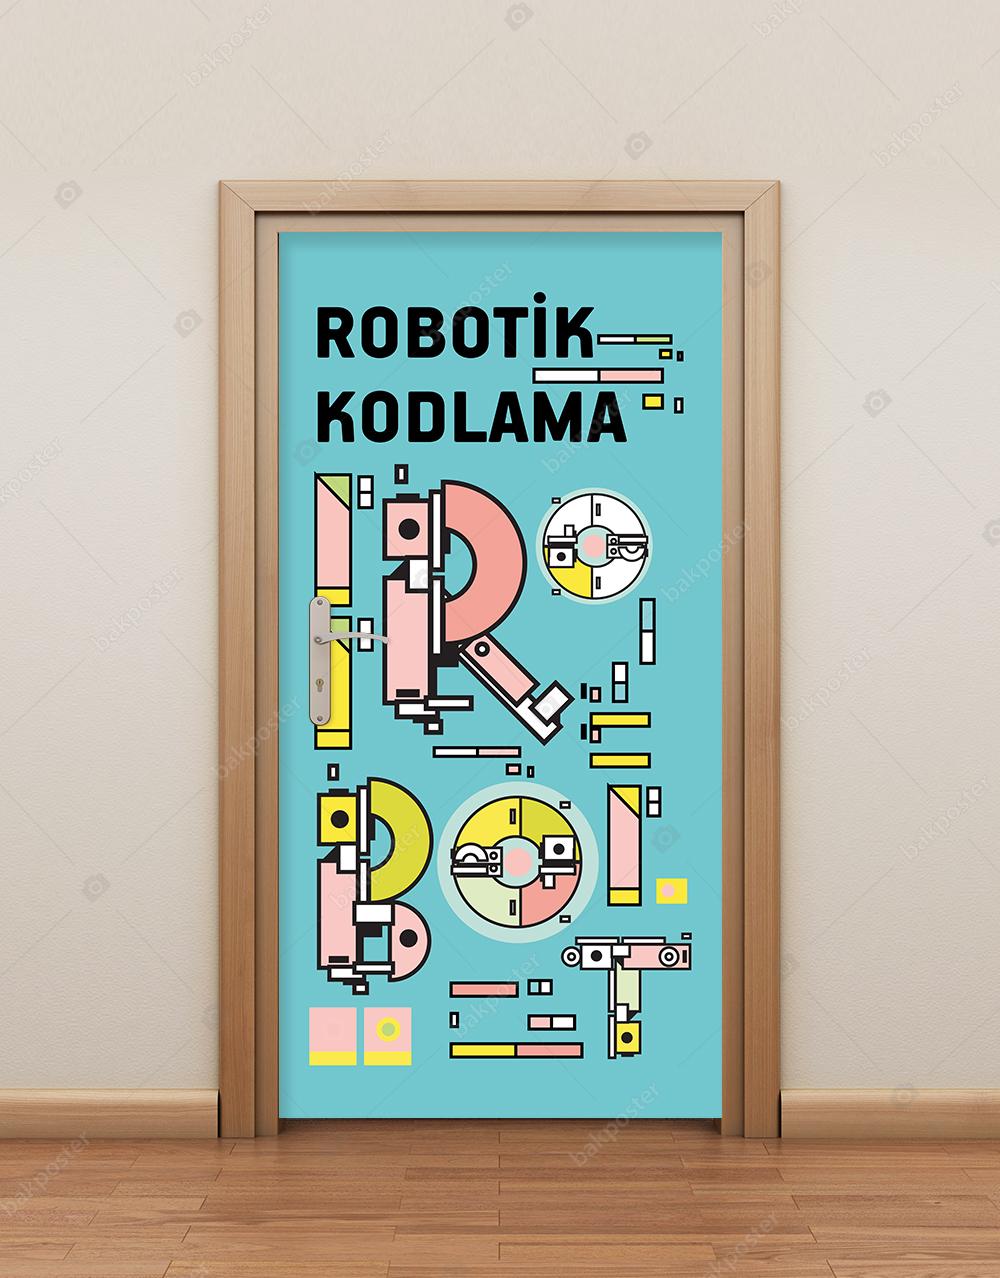 Robotik Kodlama Kapı Giydirme